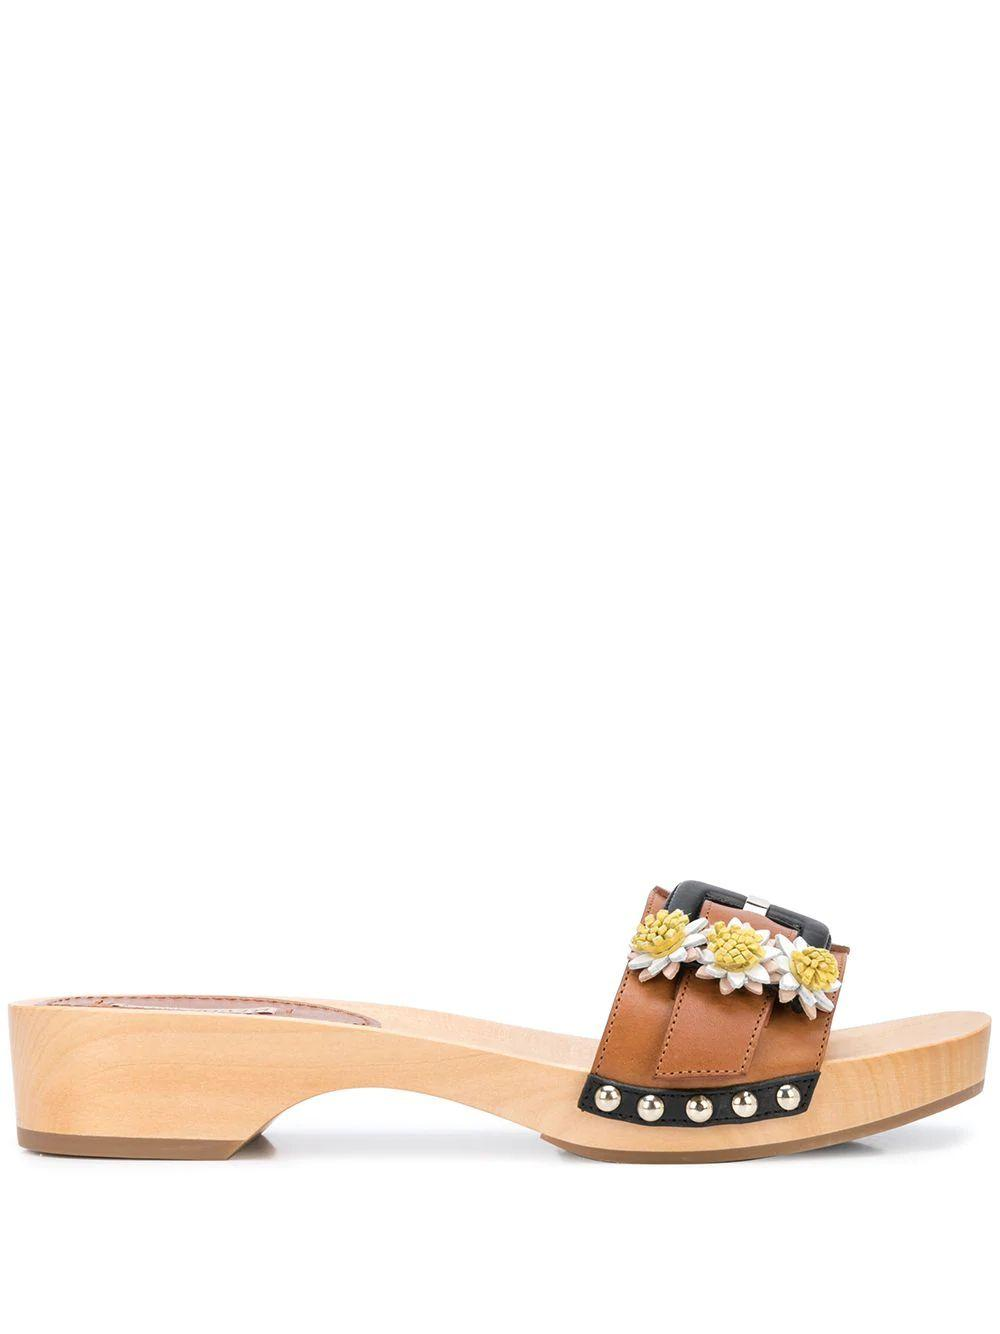 Jean Daisy Mini Mule Sandal Item # FV445